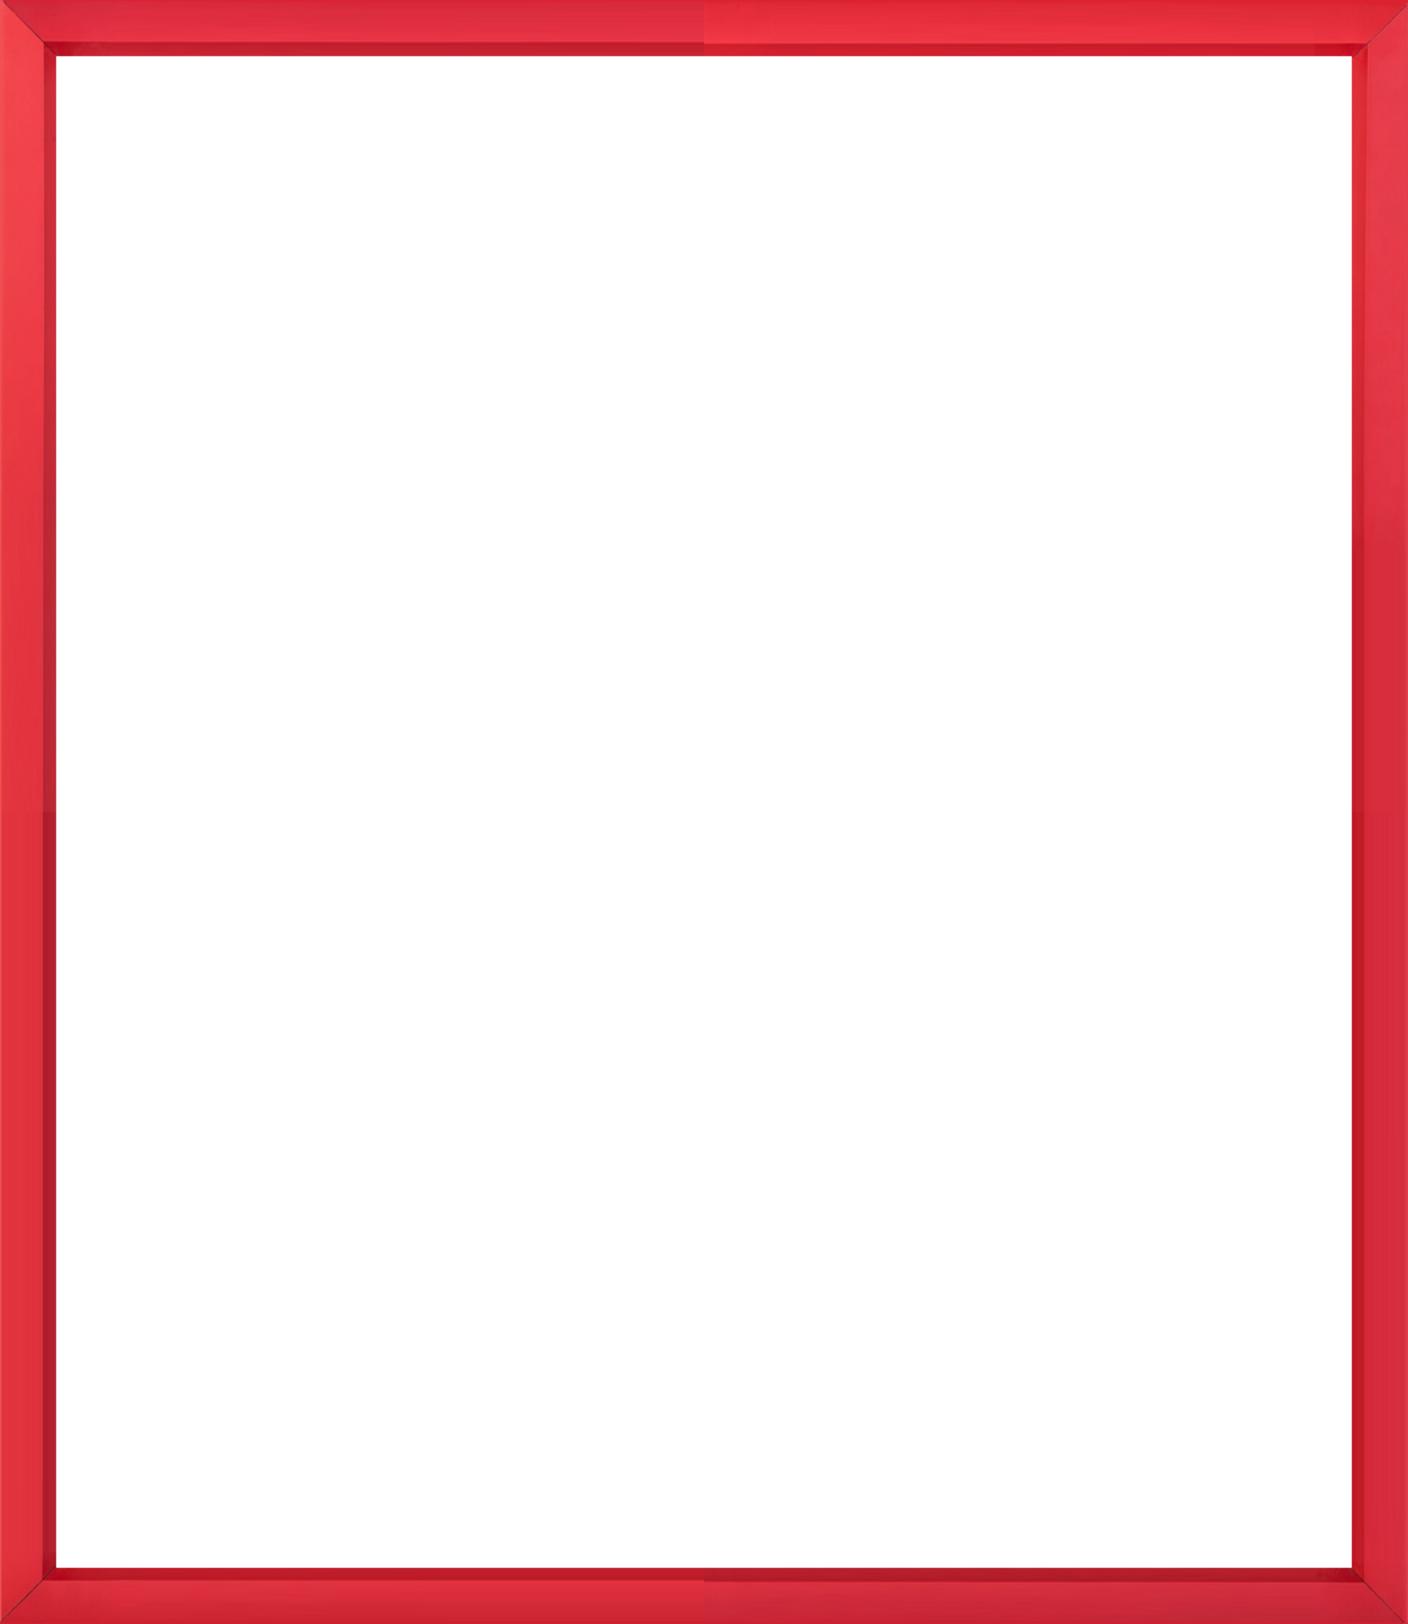 787-1426661568